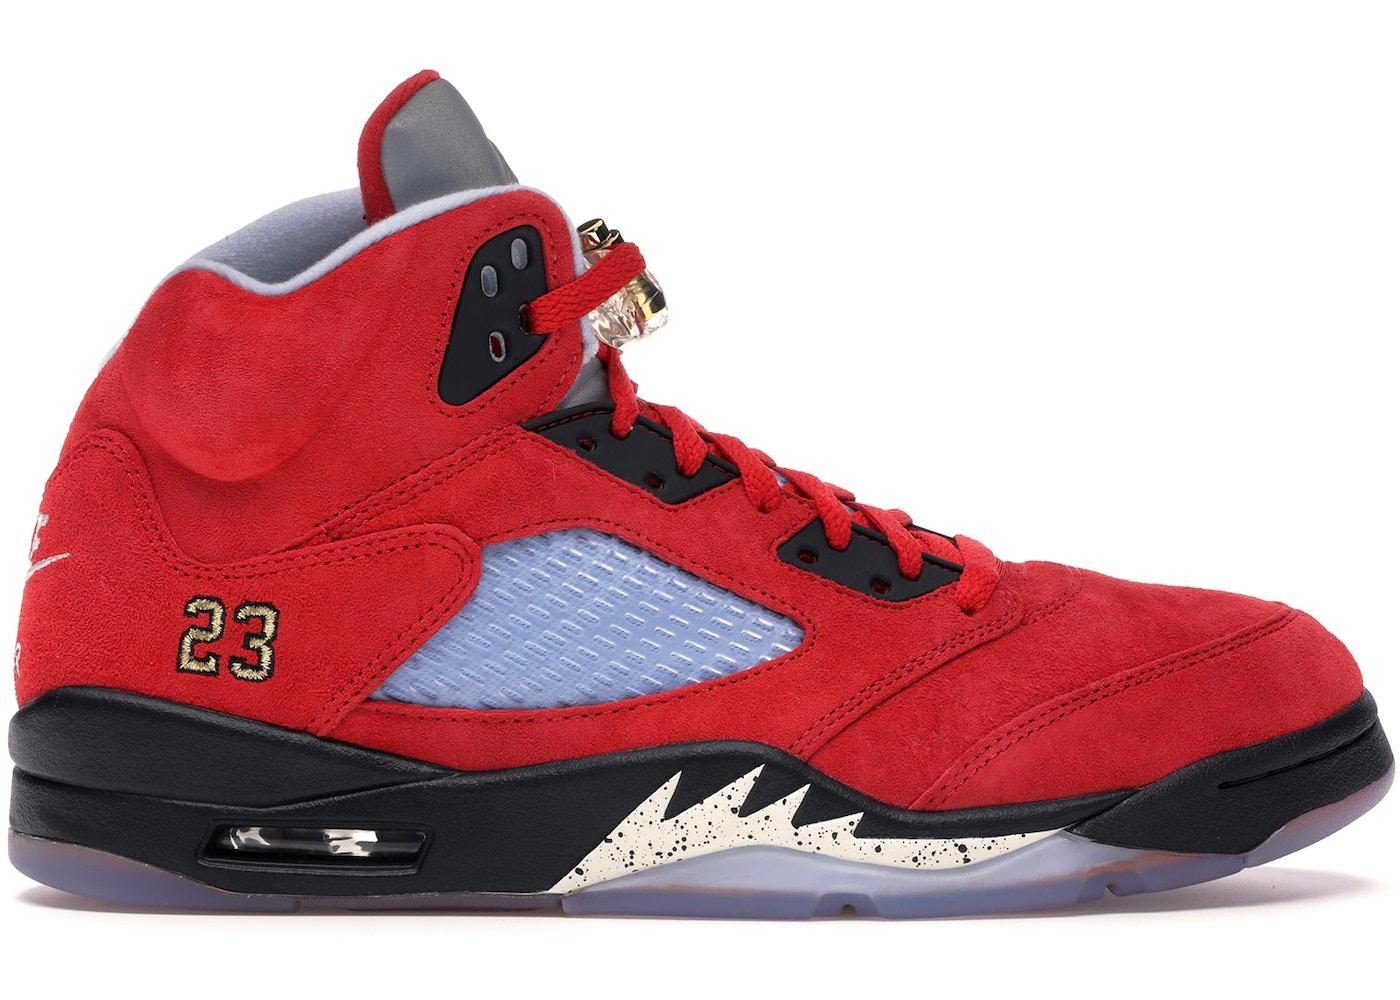 8e8e92b8398 Air Jordan Shoes - Average Sale Price